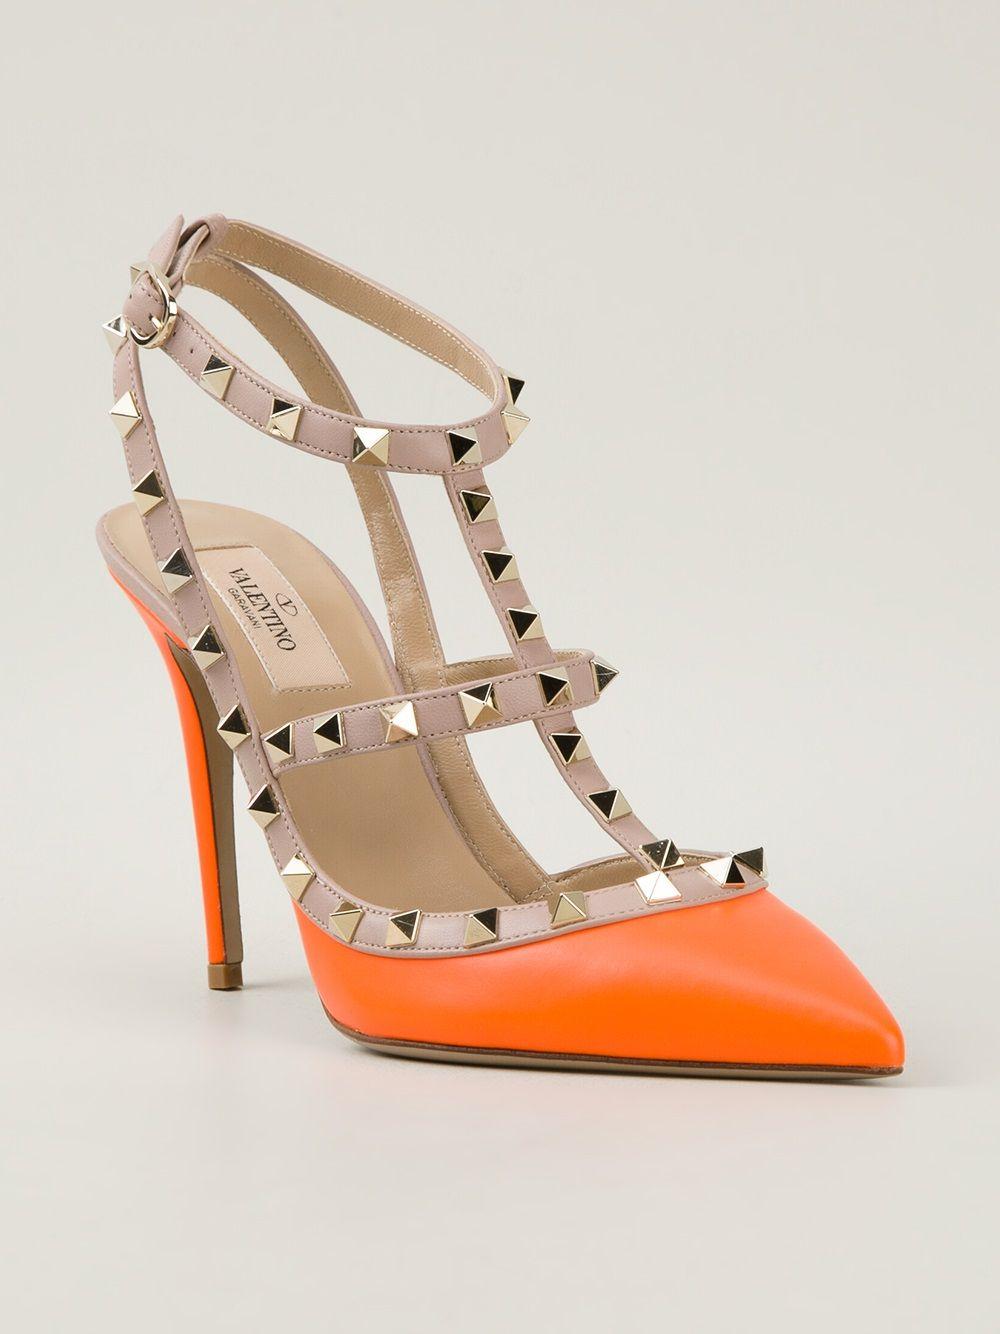 eac78944e8d Women s Orange Rockstud Heeled Pumps